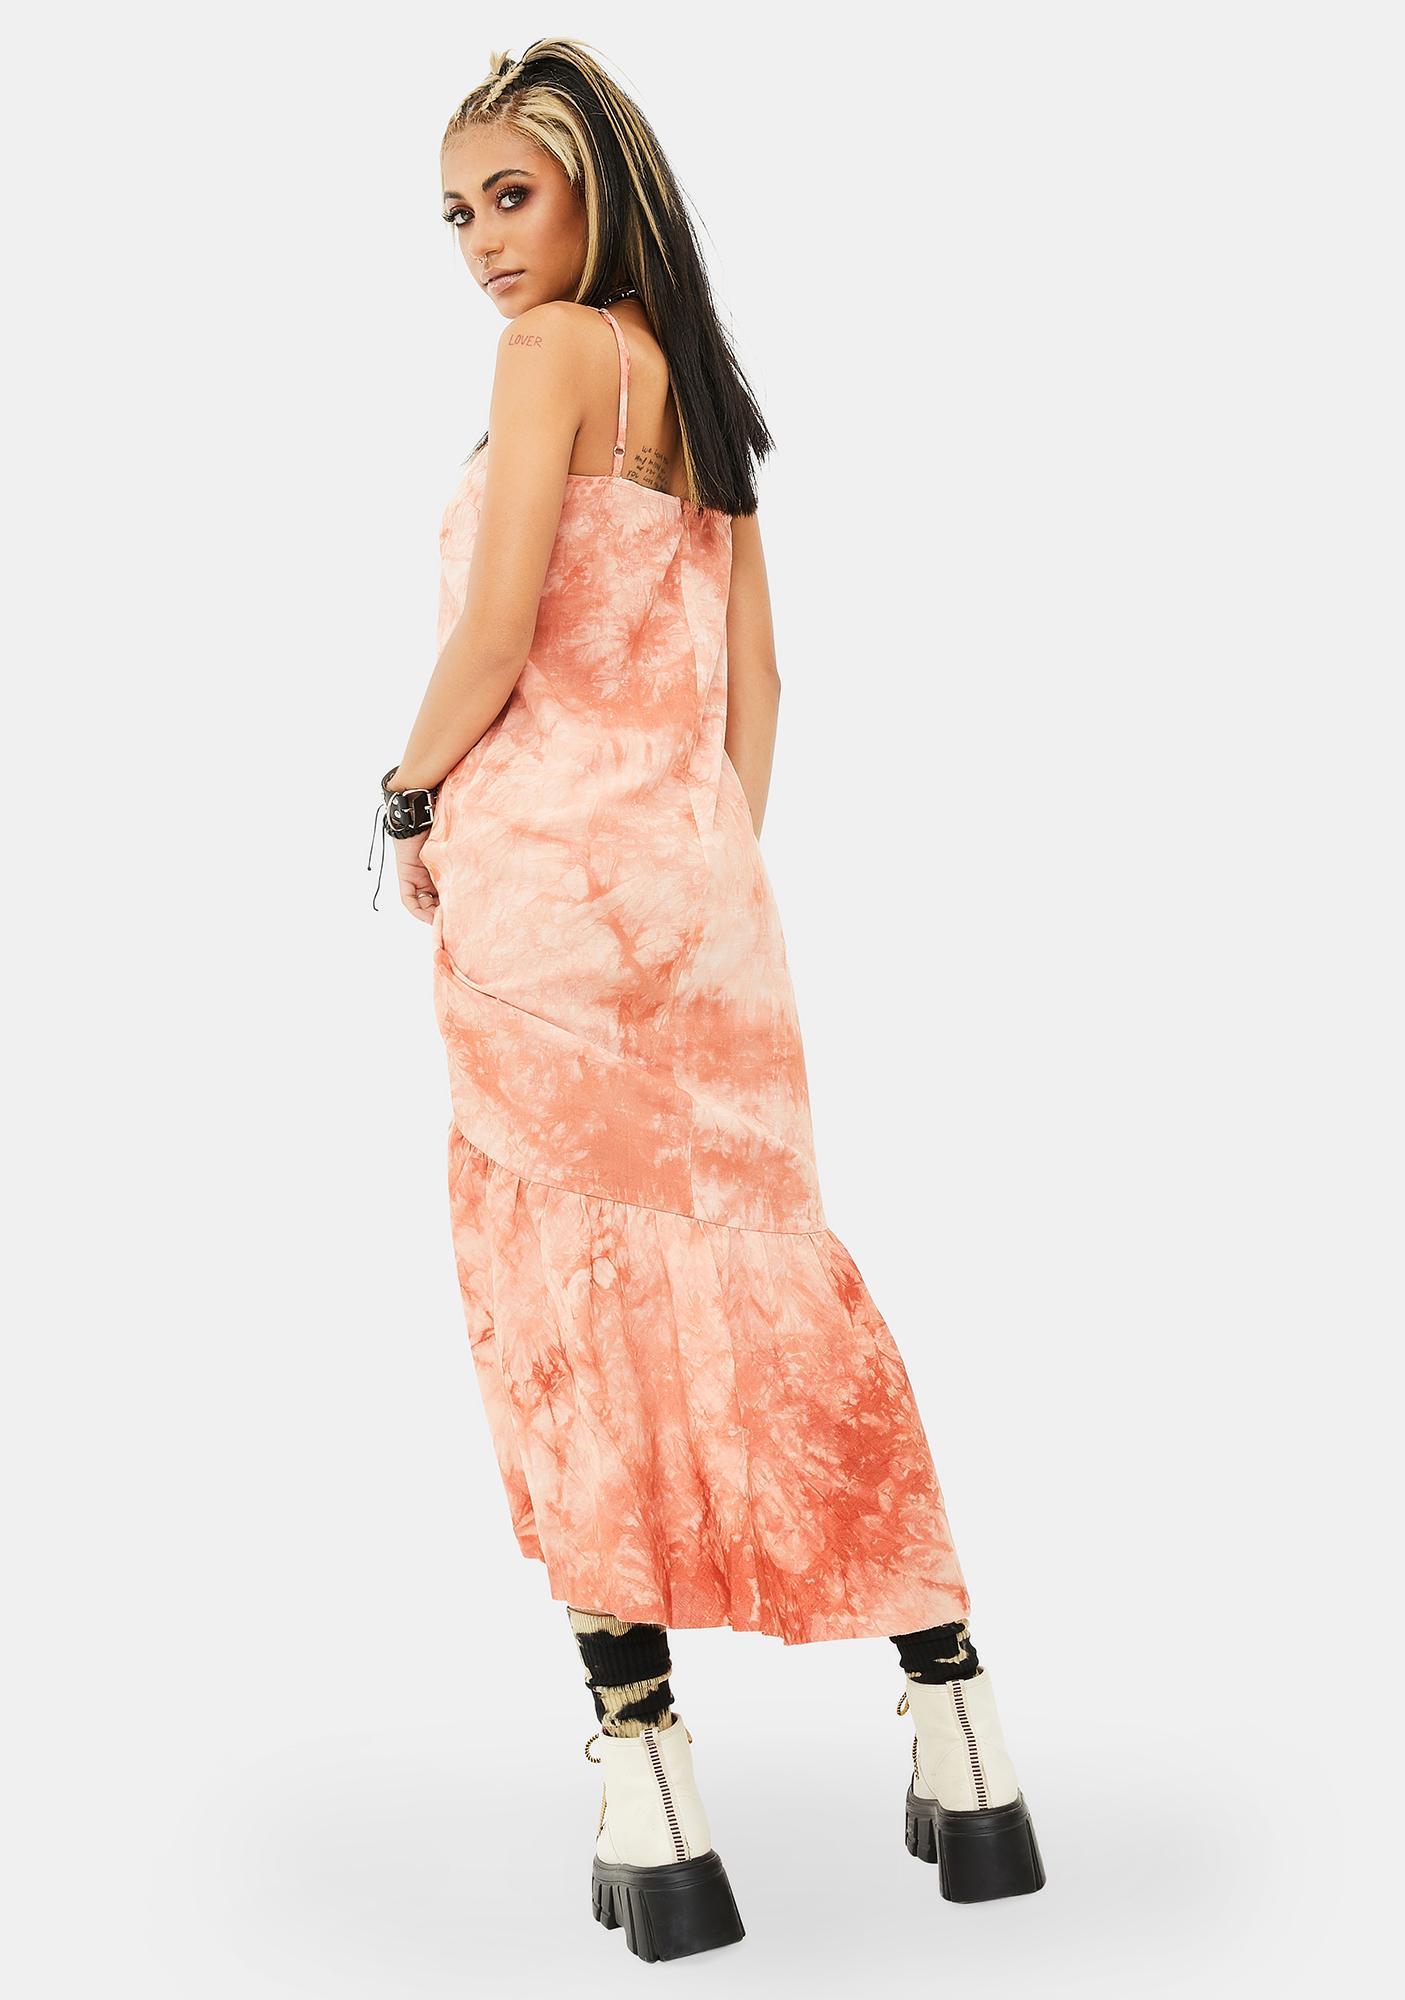 ZYA Paprika Dress